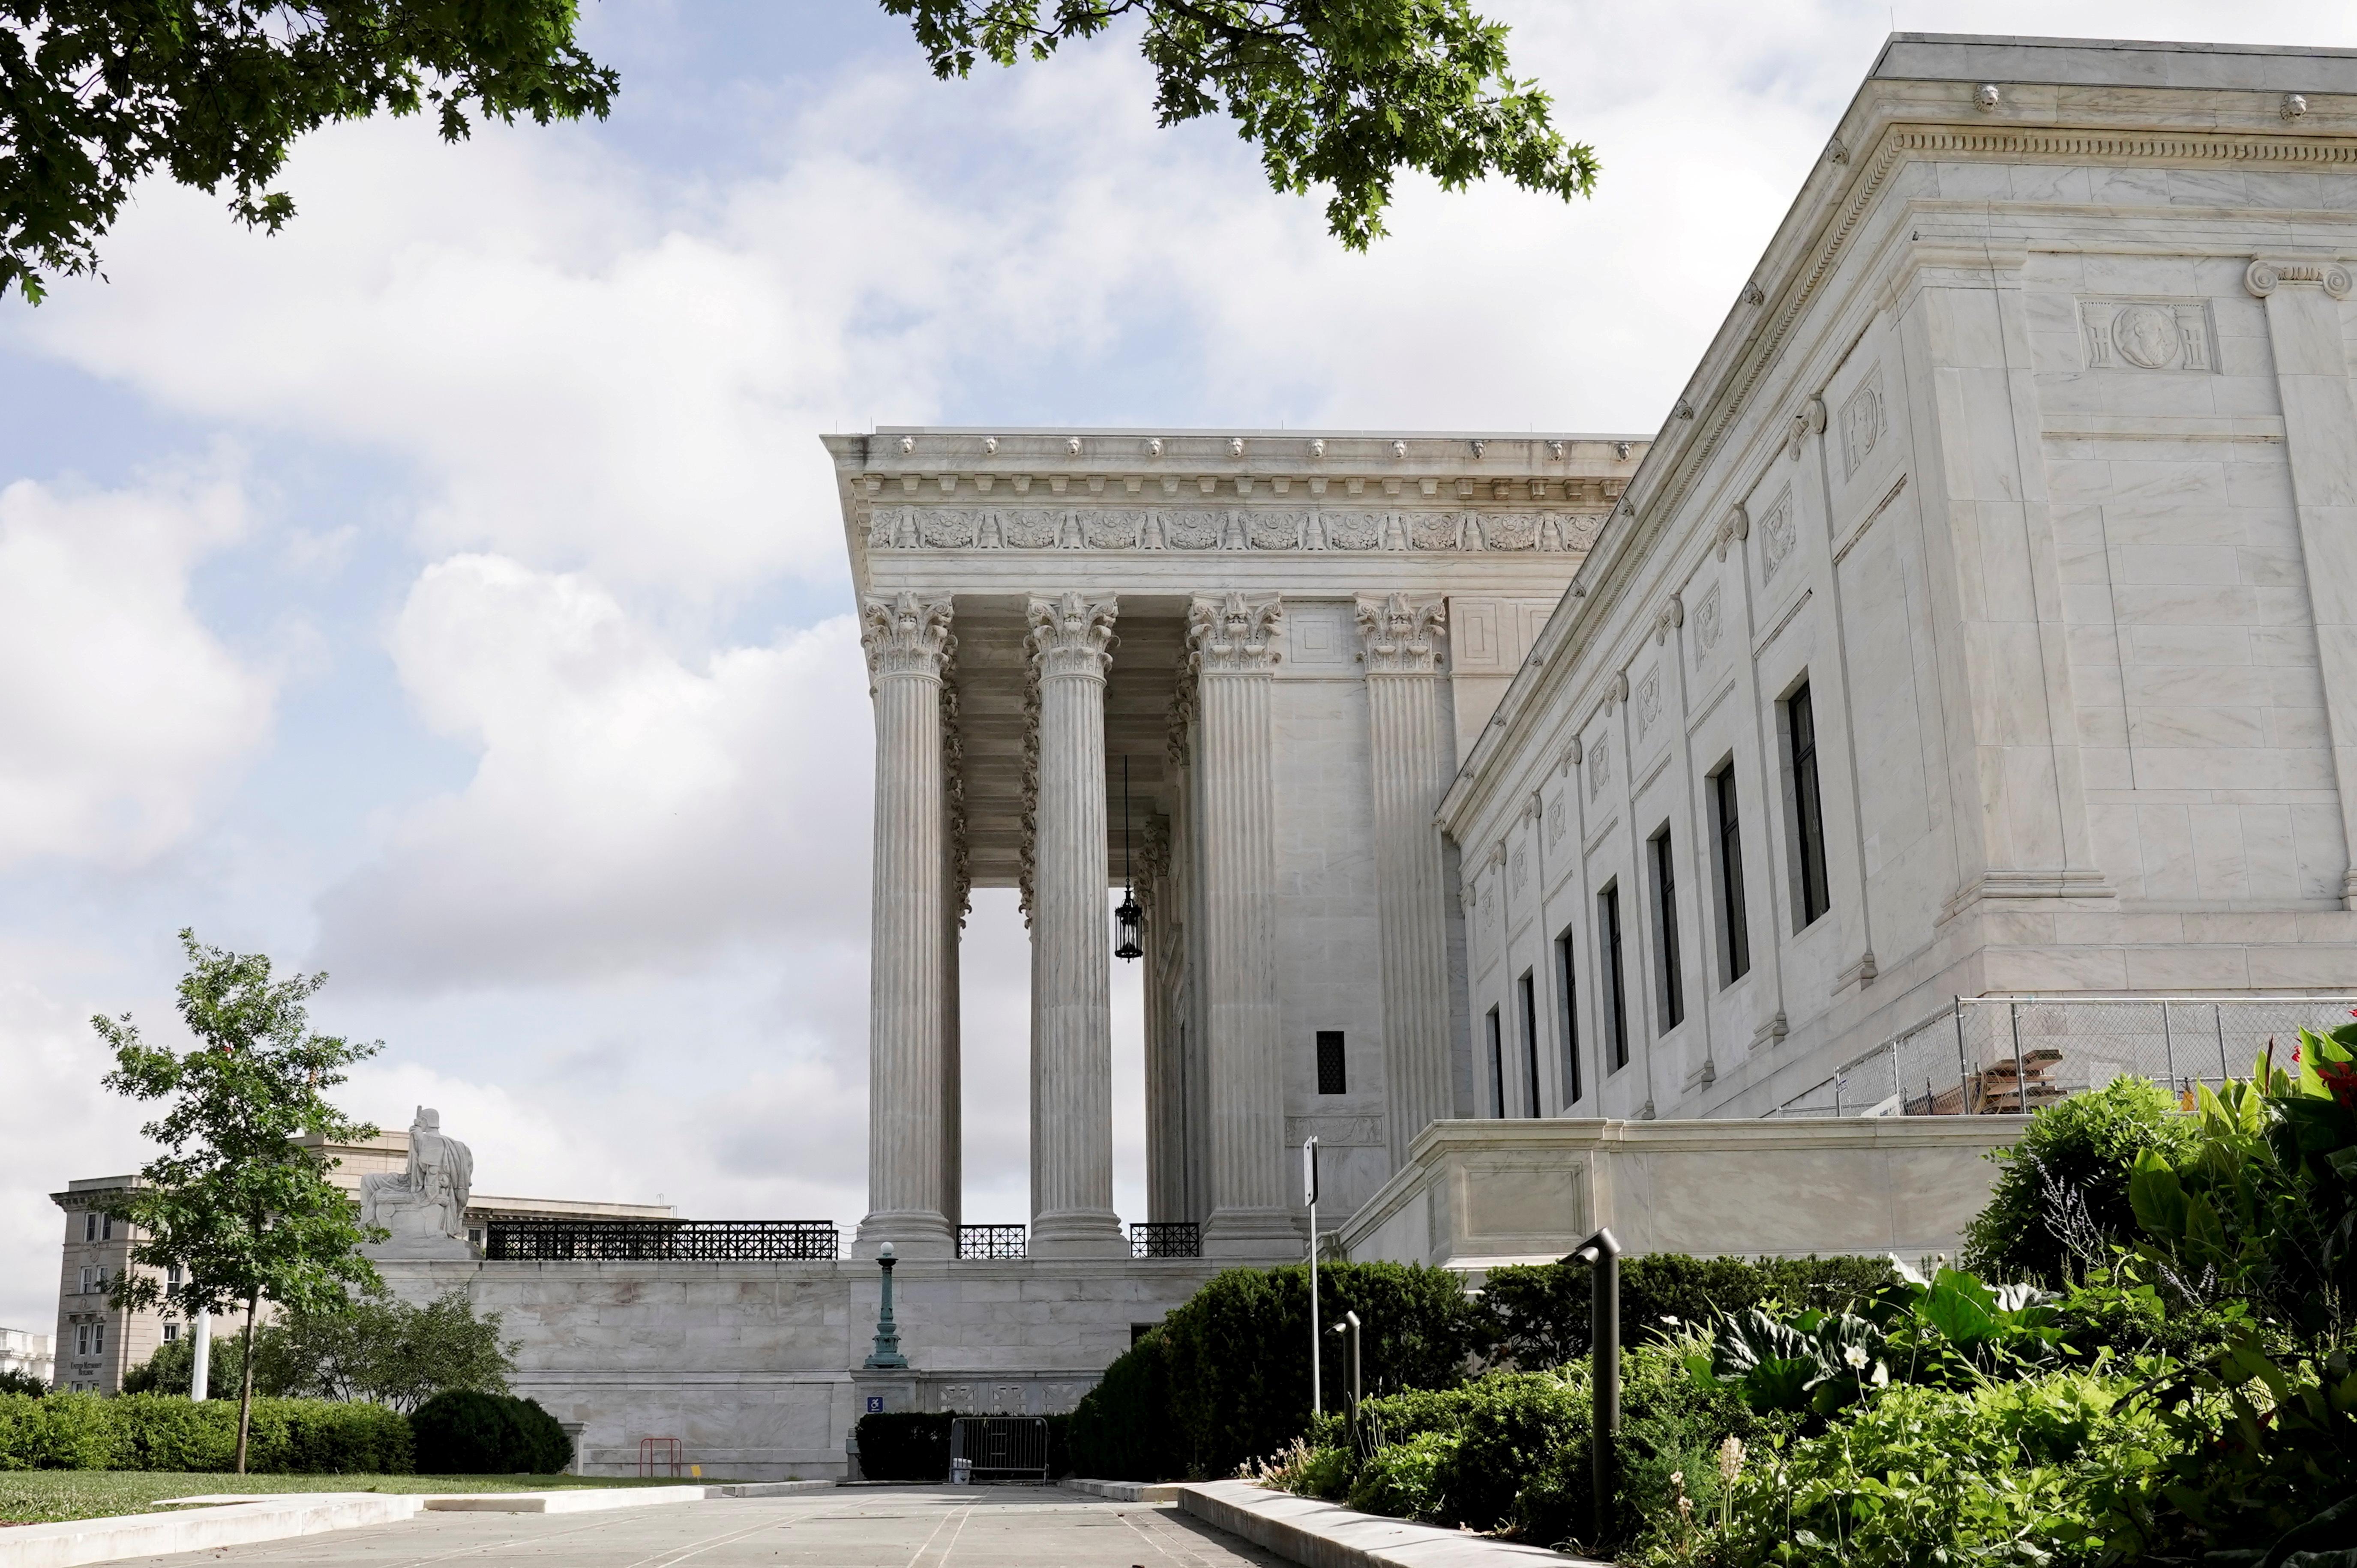 File Photo: A general view of the U.S. Supreme Court building in Washington, D.C. REUTERS/Ken Cedeno